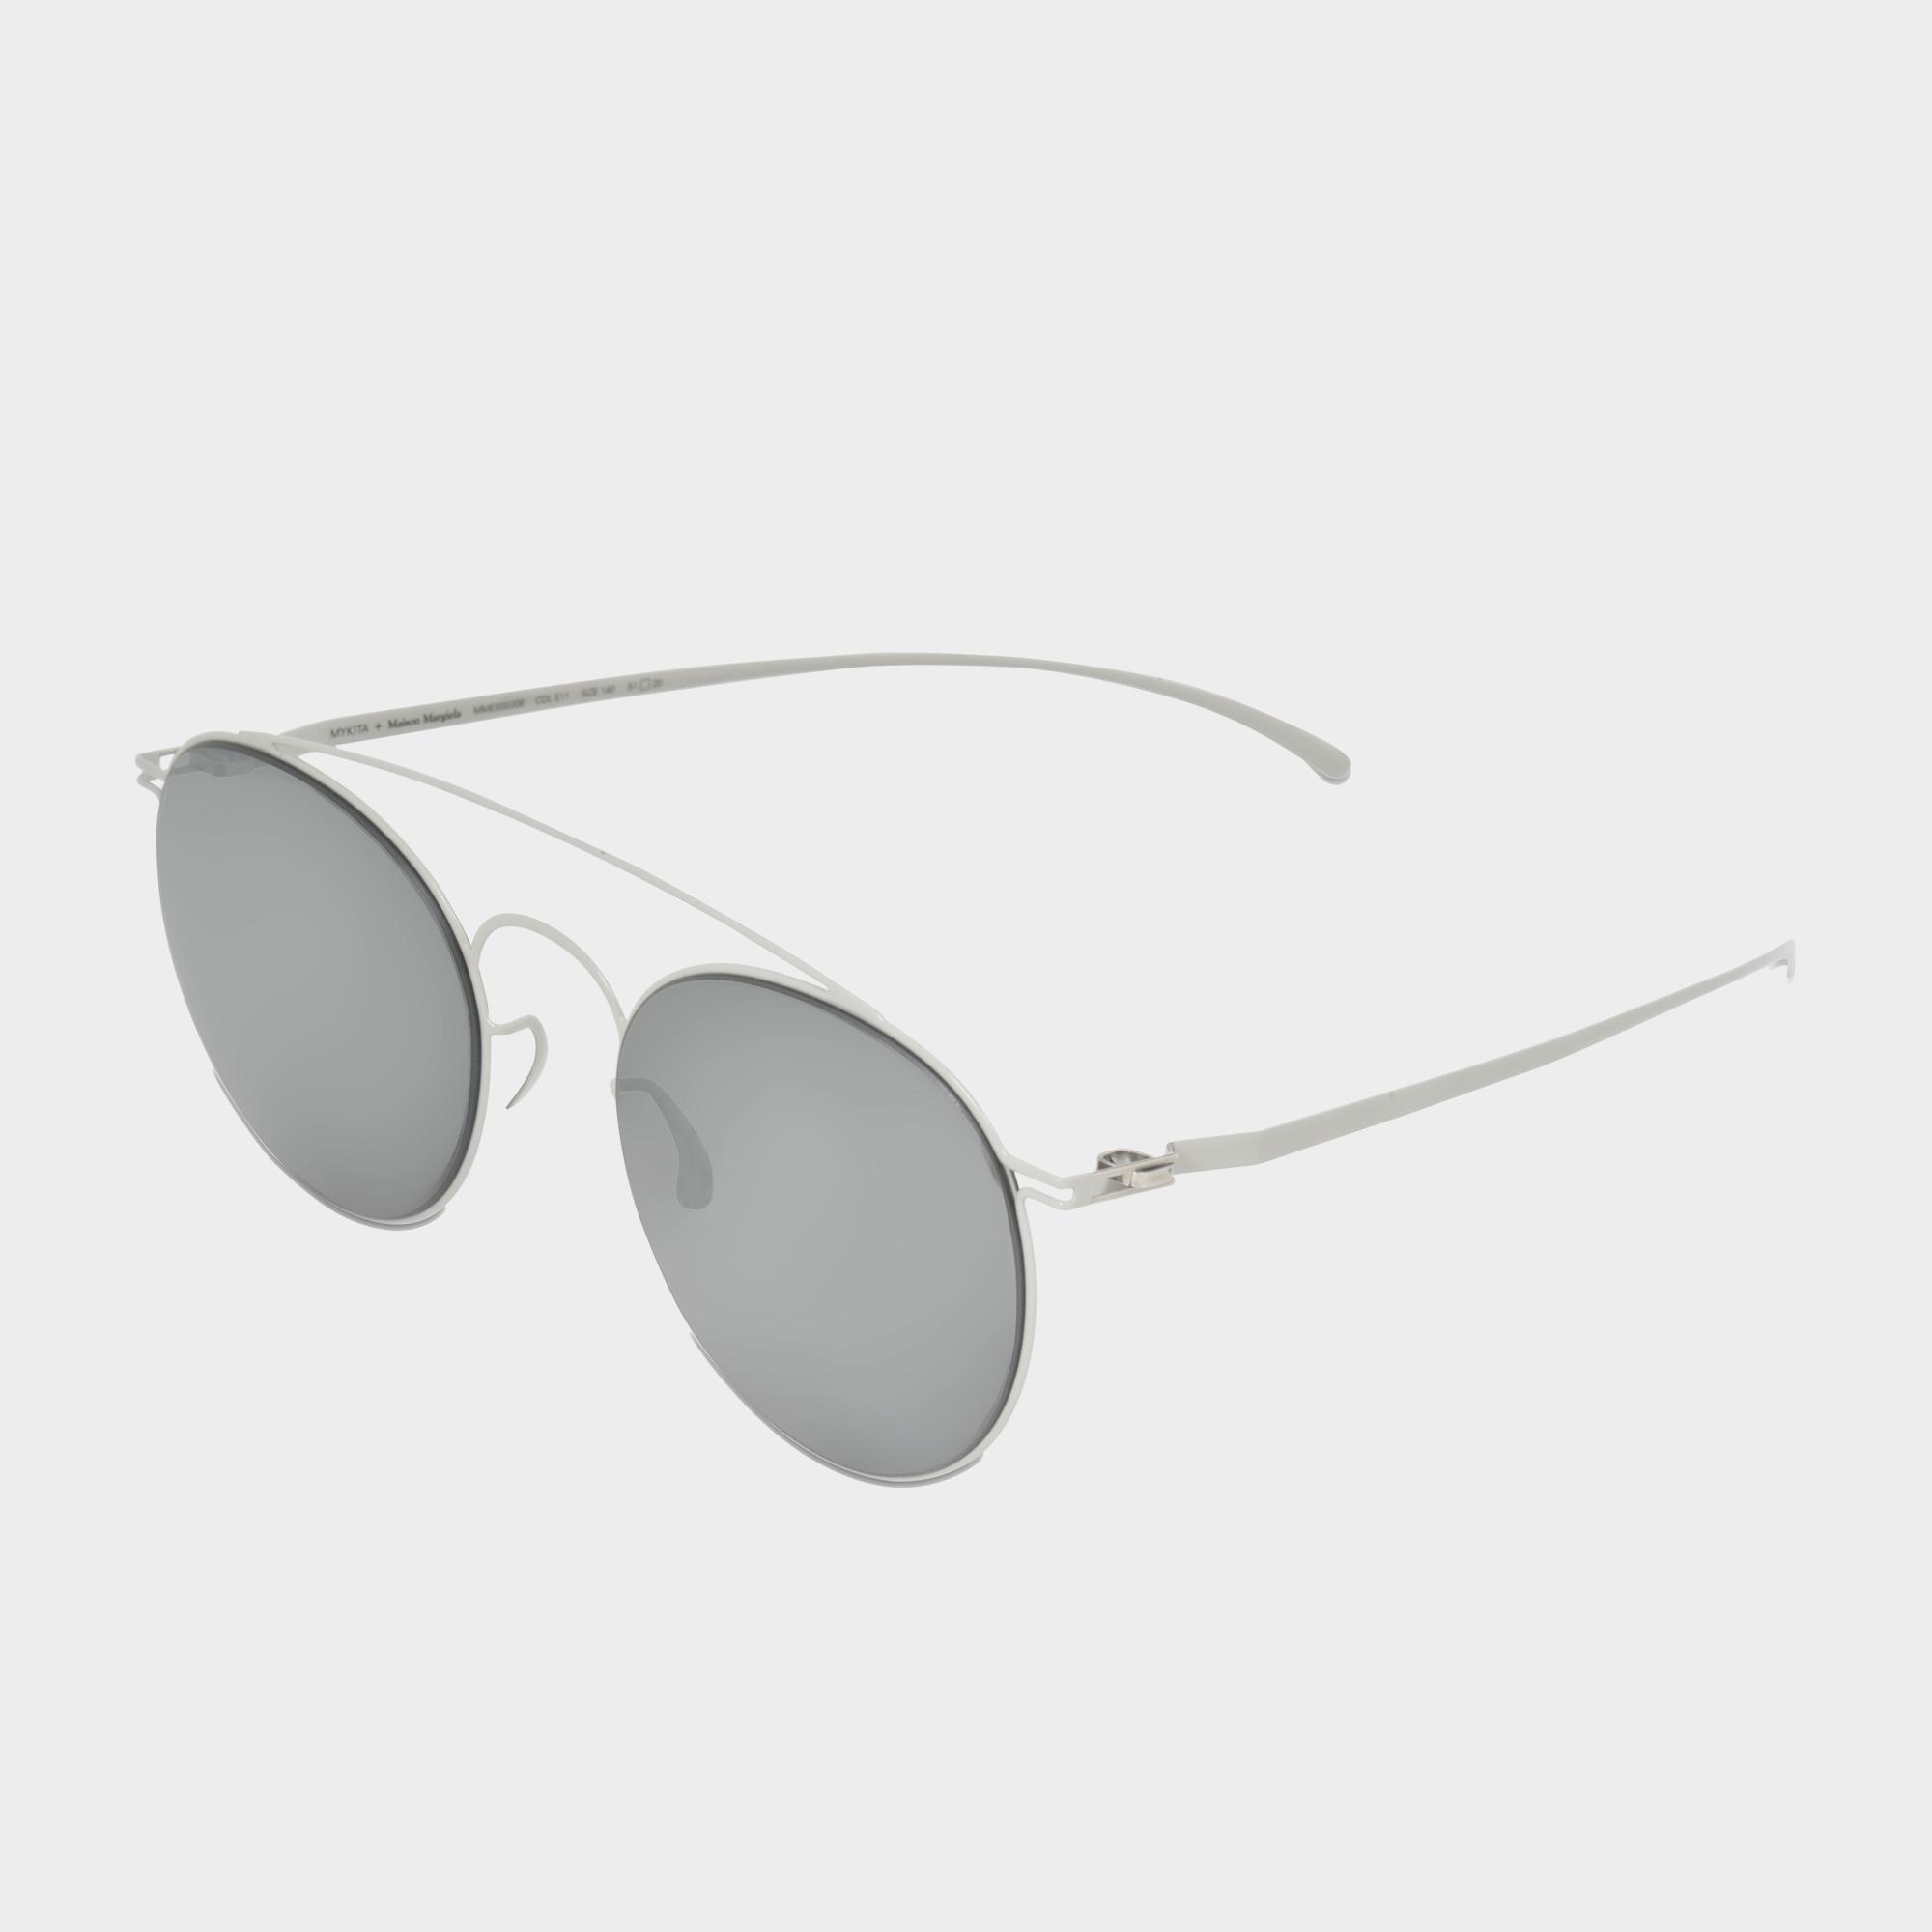 Maison Margiela Mykita & Mmesseoo6 Sunglasses in Grey (Grey)